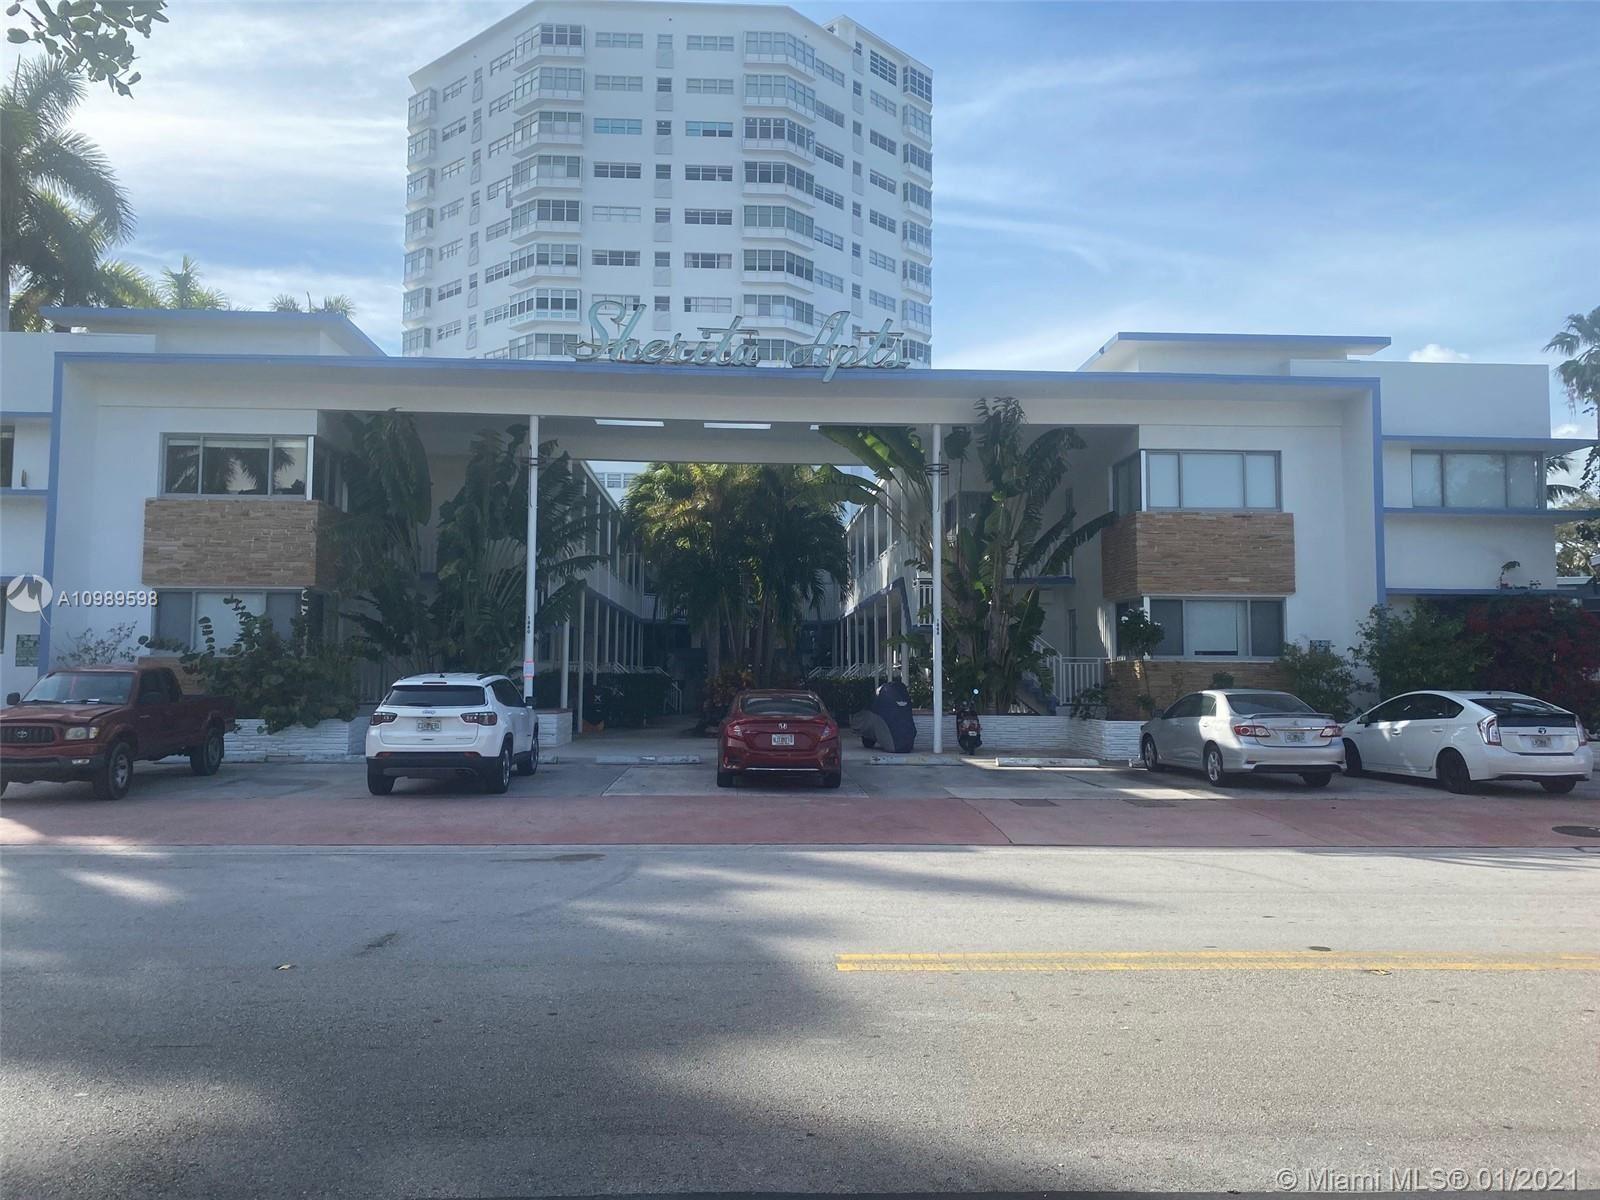 1840 SE James Ave #3, Miami Beach, FL 33139 - #: A10989598